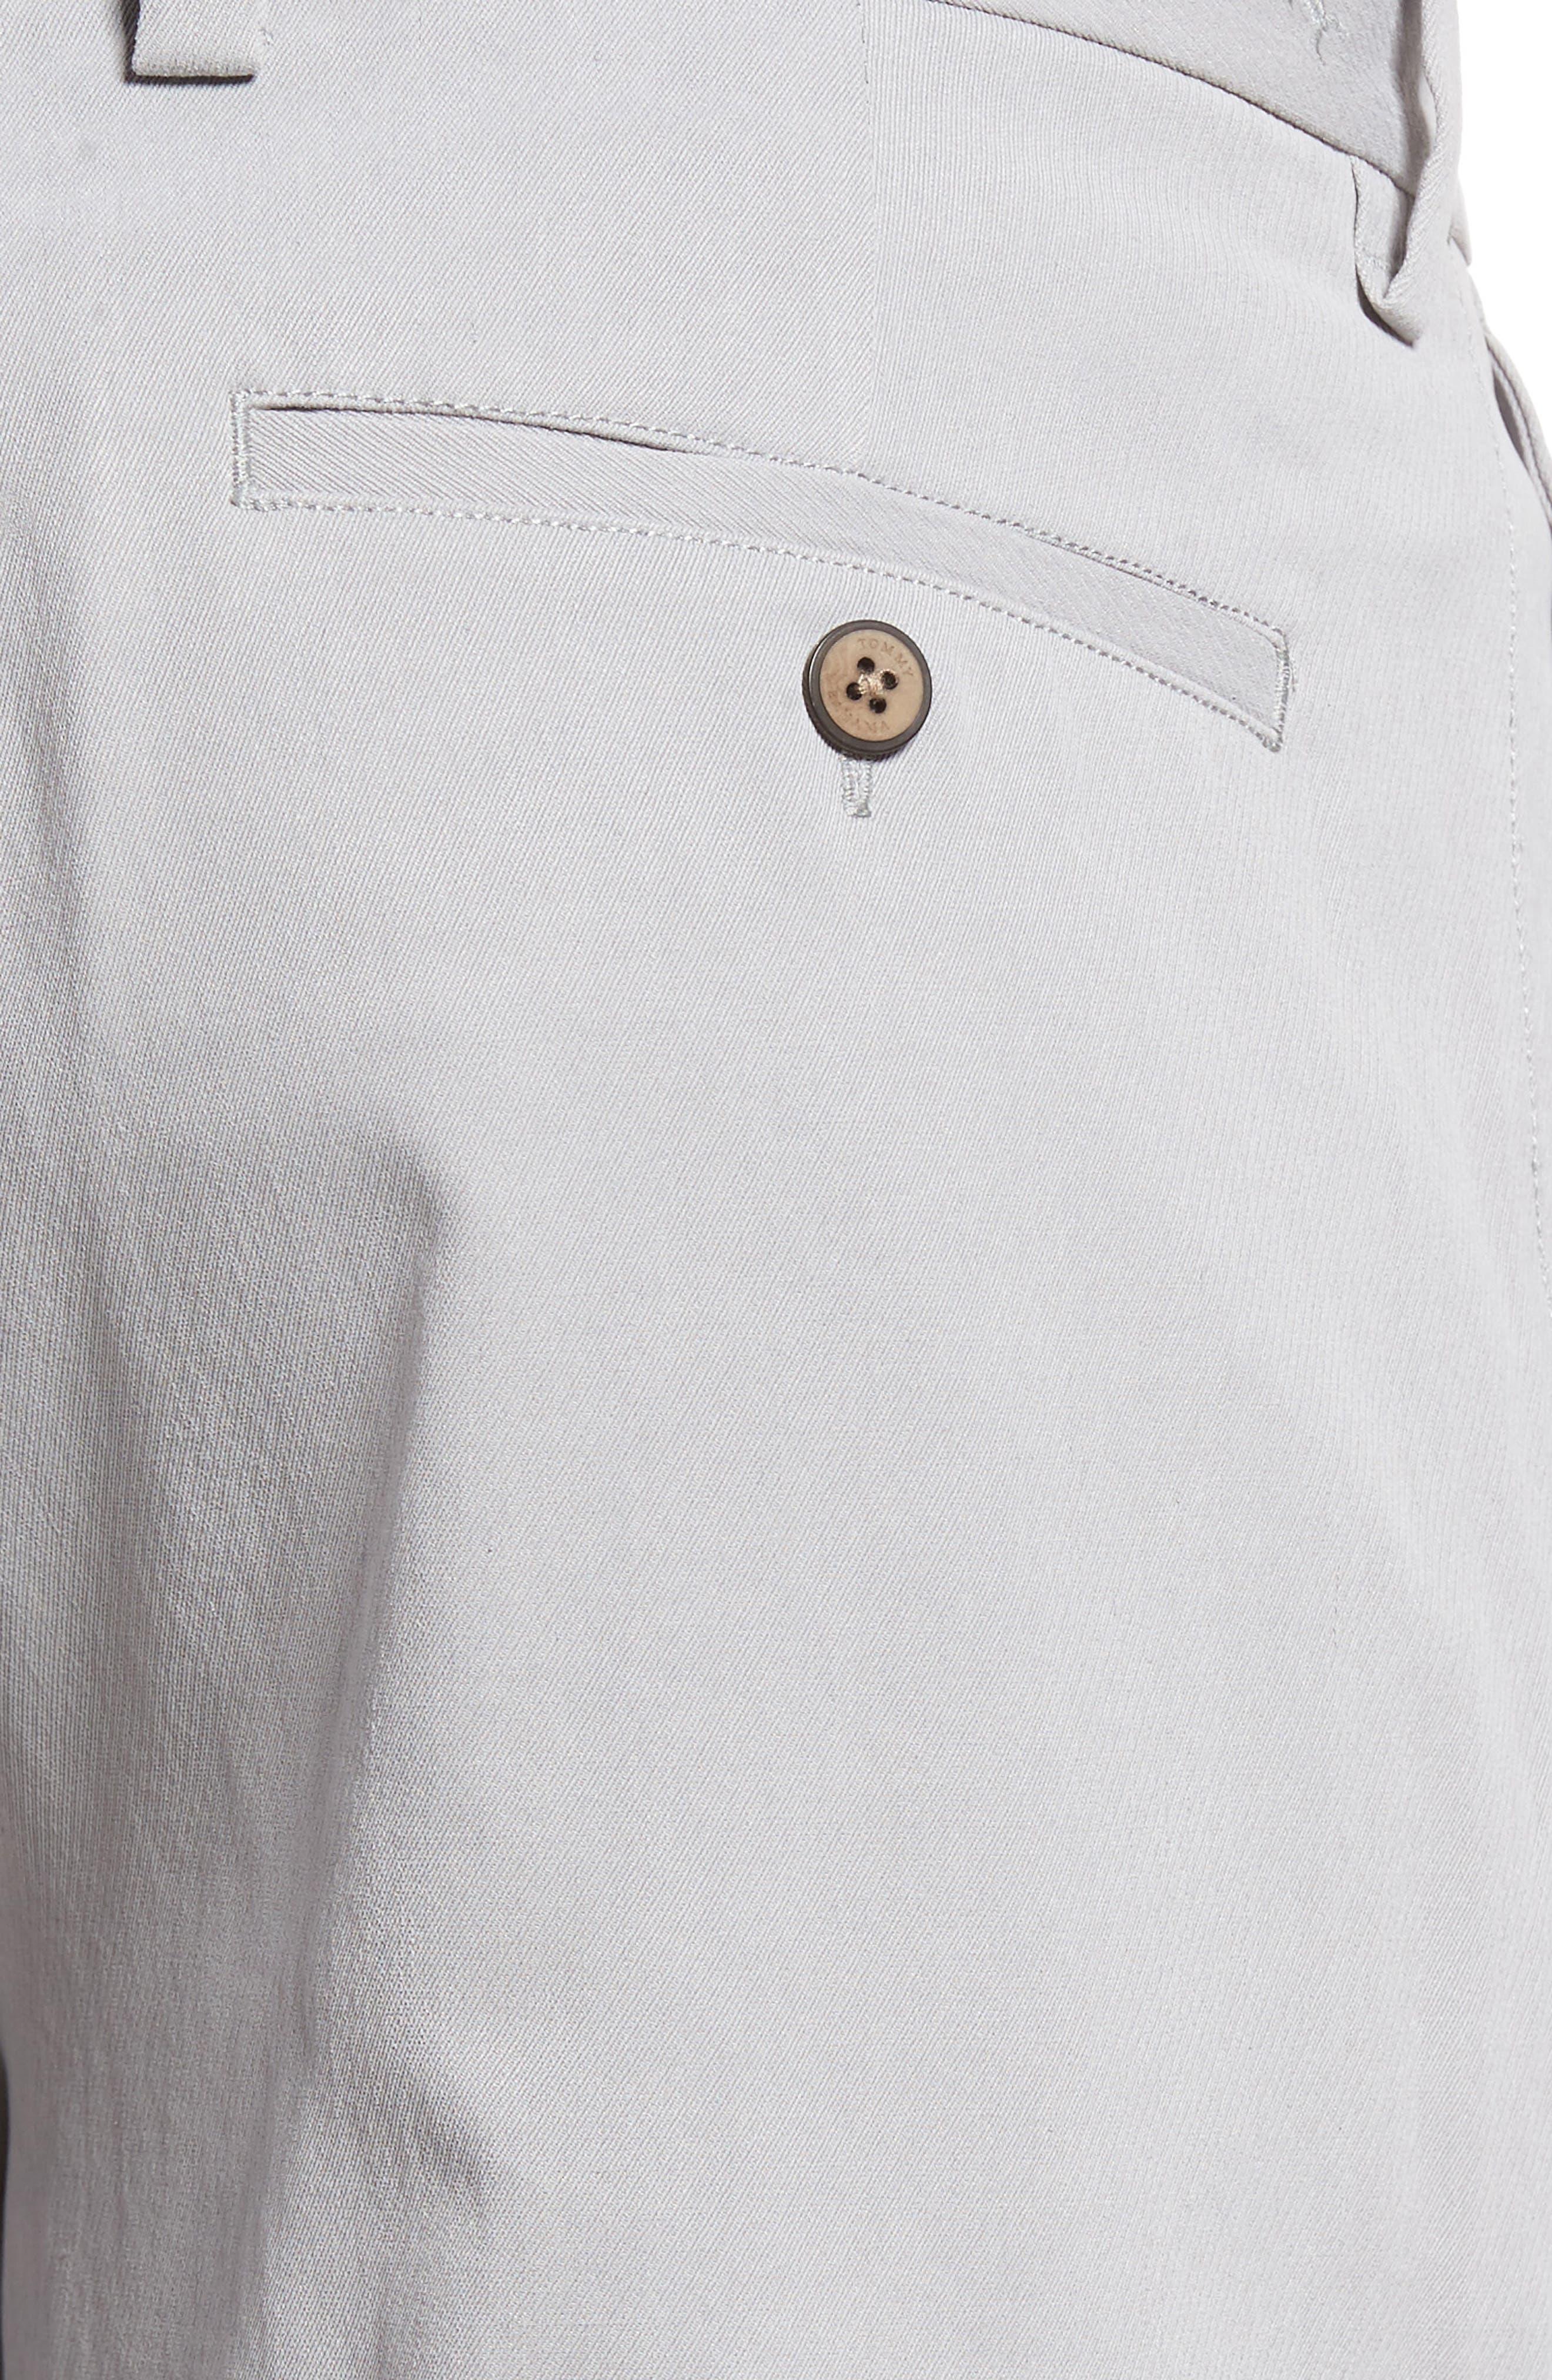 St. Thomas Pleated Shorts,                             Alternate thumbnail 20, color,